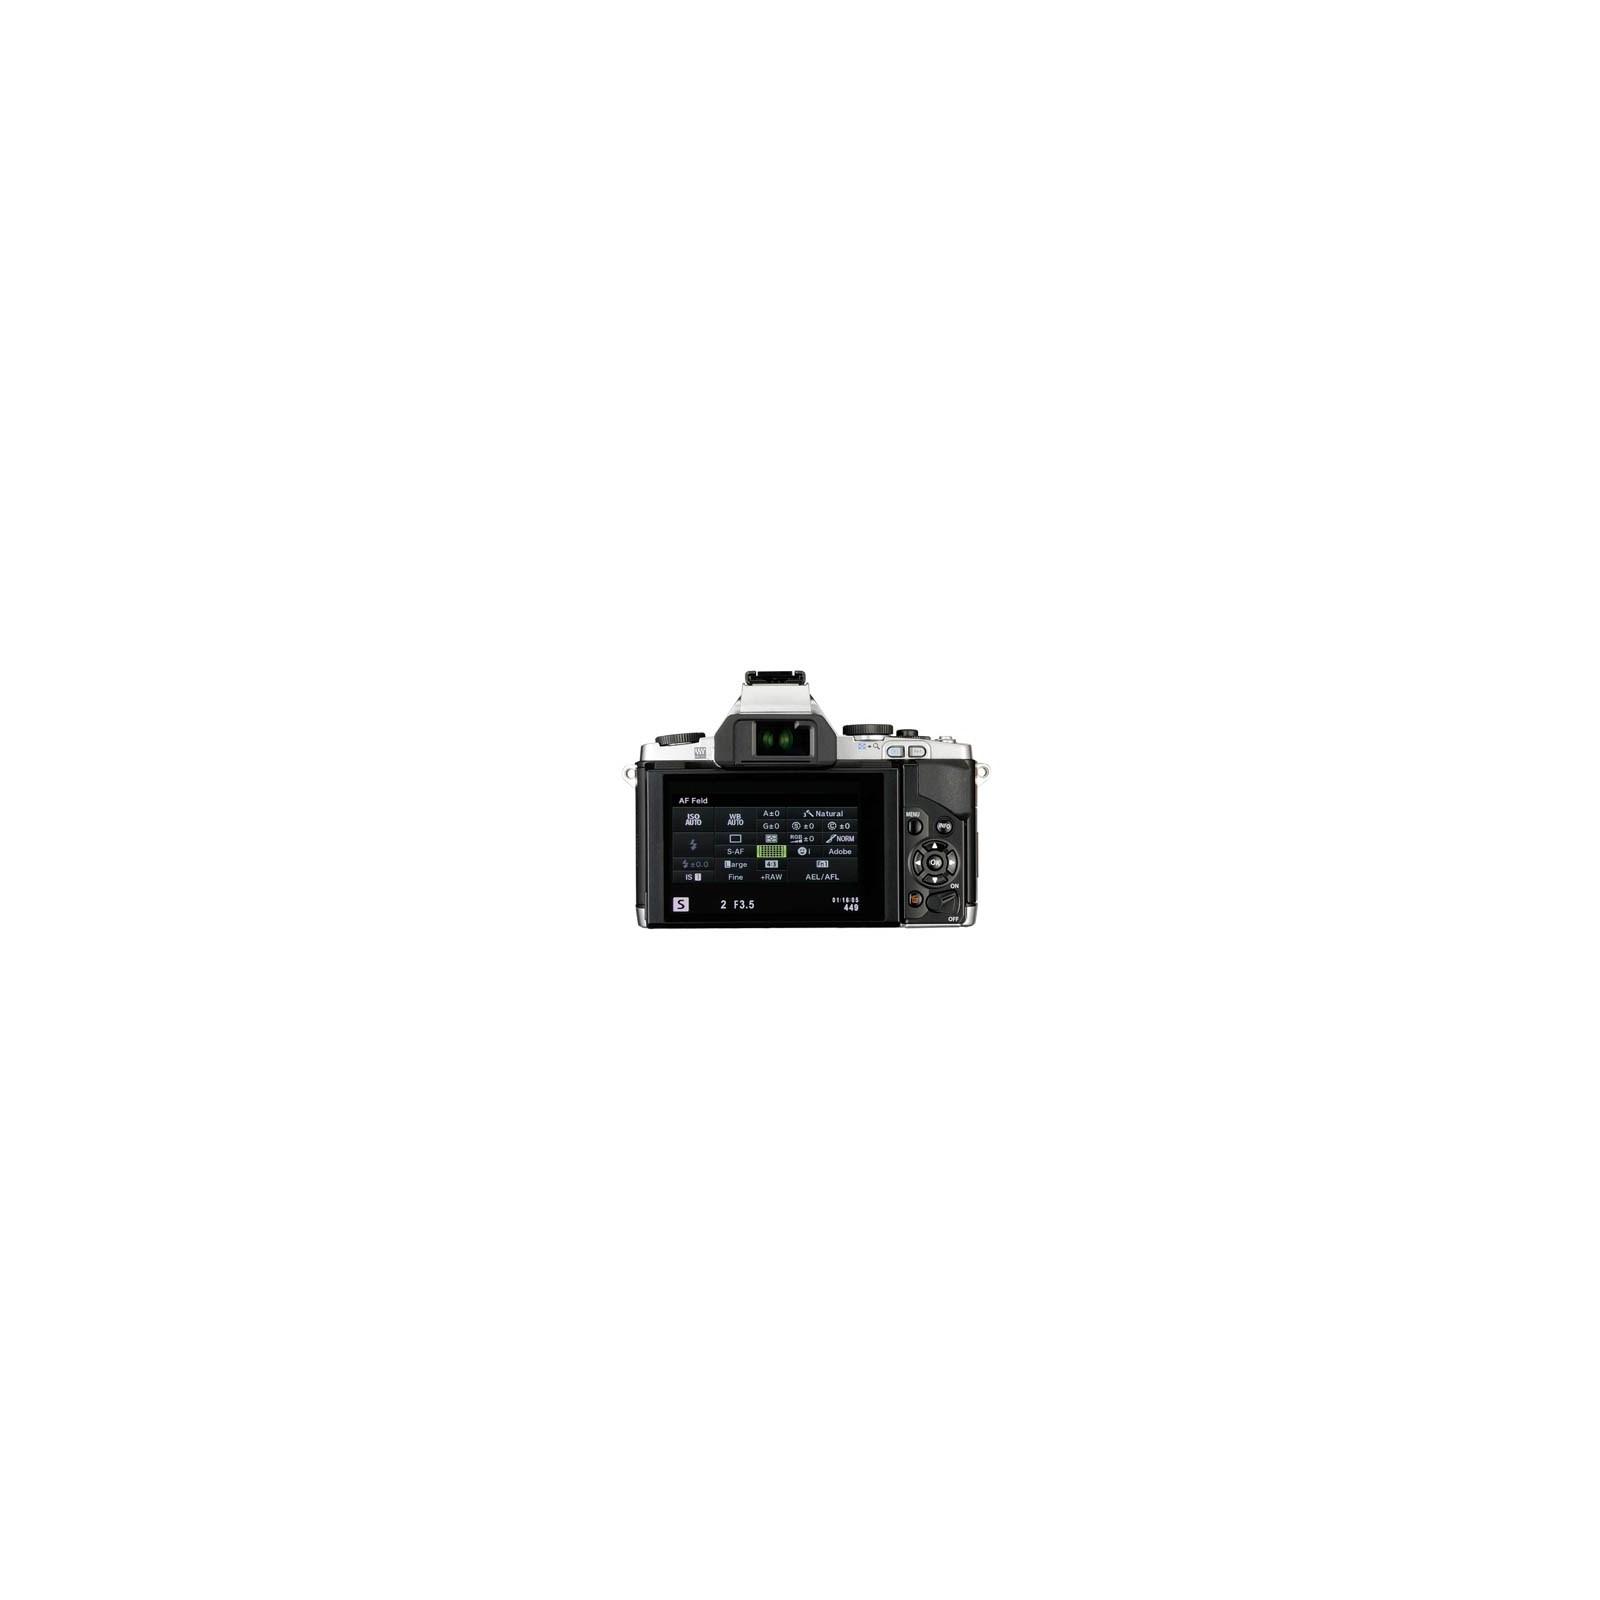 Цифровой фотоаппарат OLYMPUS OM-D E-M5 body silver (V204040SE000) изображение 2